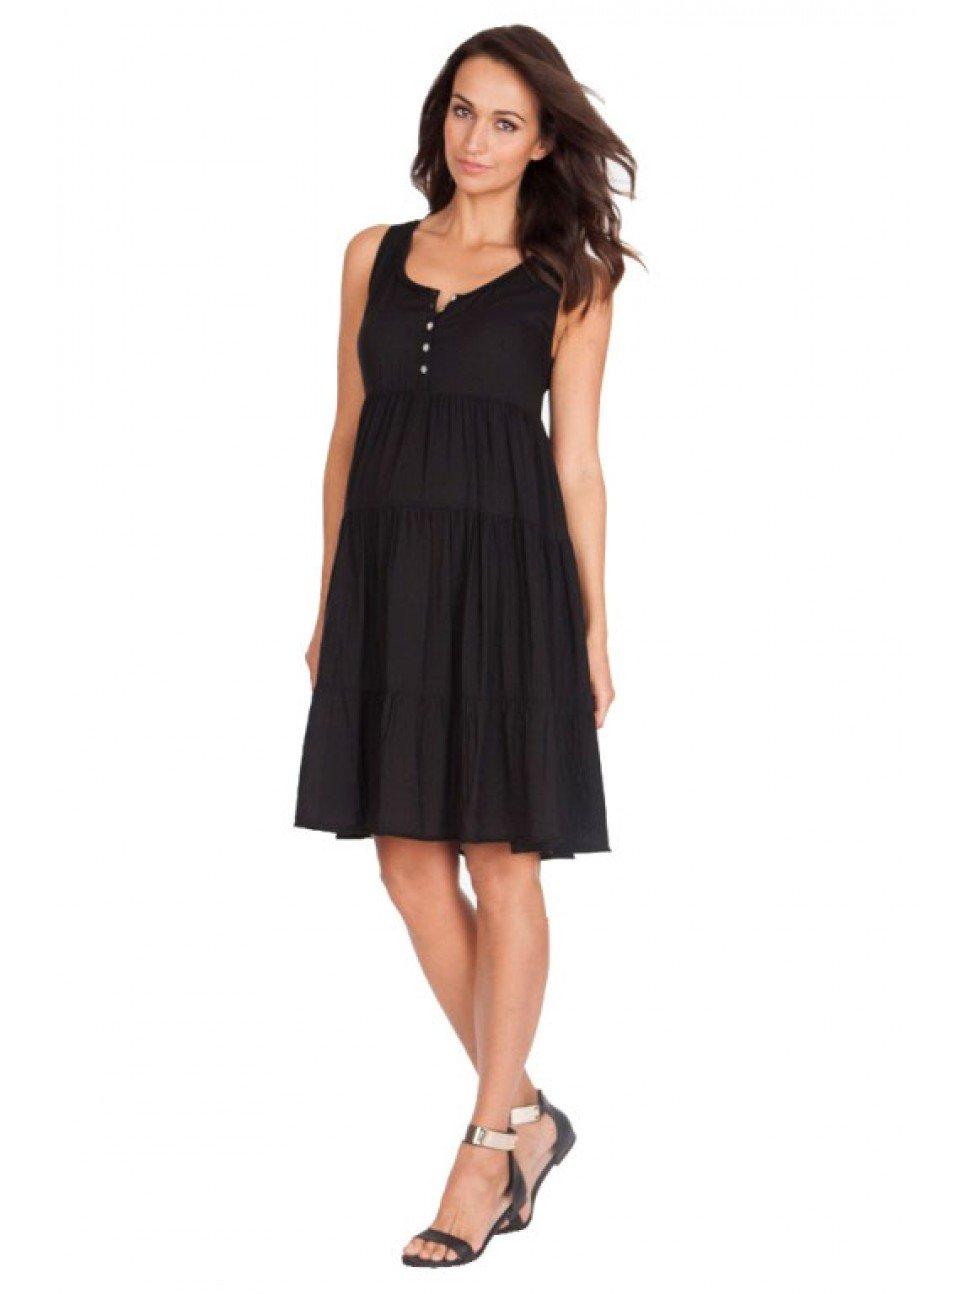 Maternity Sundress | Sequin Maternity Dress | Sears Maternity Dresses